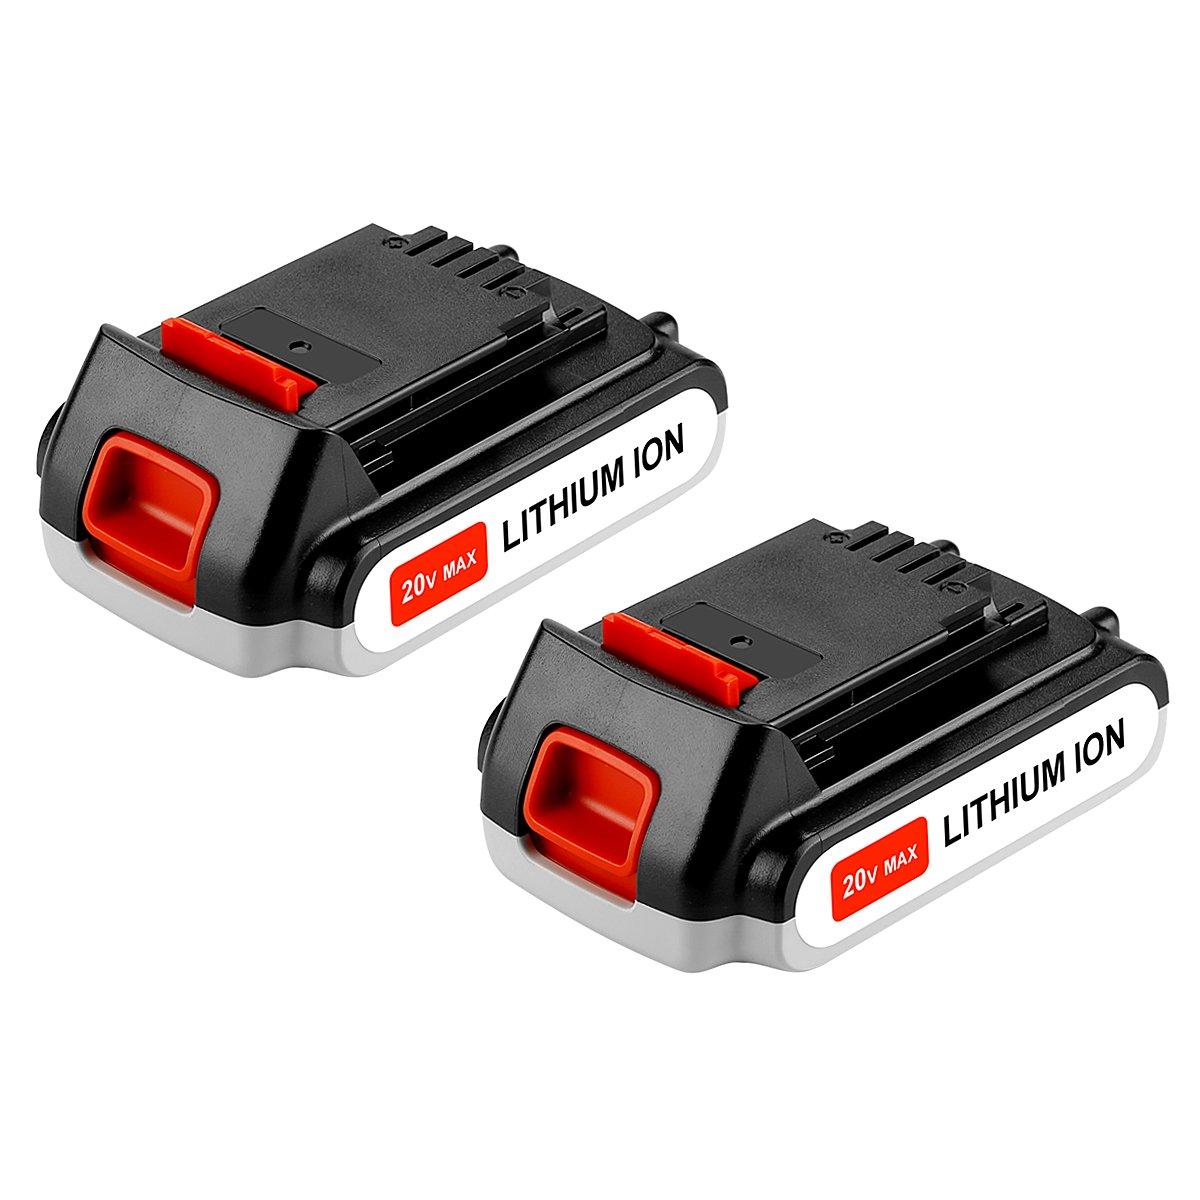 Powilling 2 Pack 20V 2.5Ah Lithium Battery for Black and Decker 20V MAX MATRIX LBXR20, LST220, LBXR20-OPE, LBXR2020, LBXR20, LB20, LBX20, 20 Volt Replacement Battery for Black+Decker Lithium